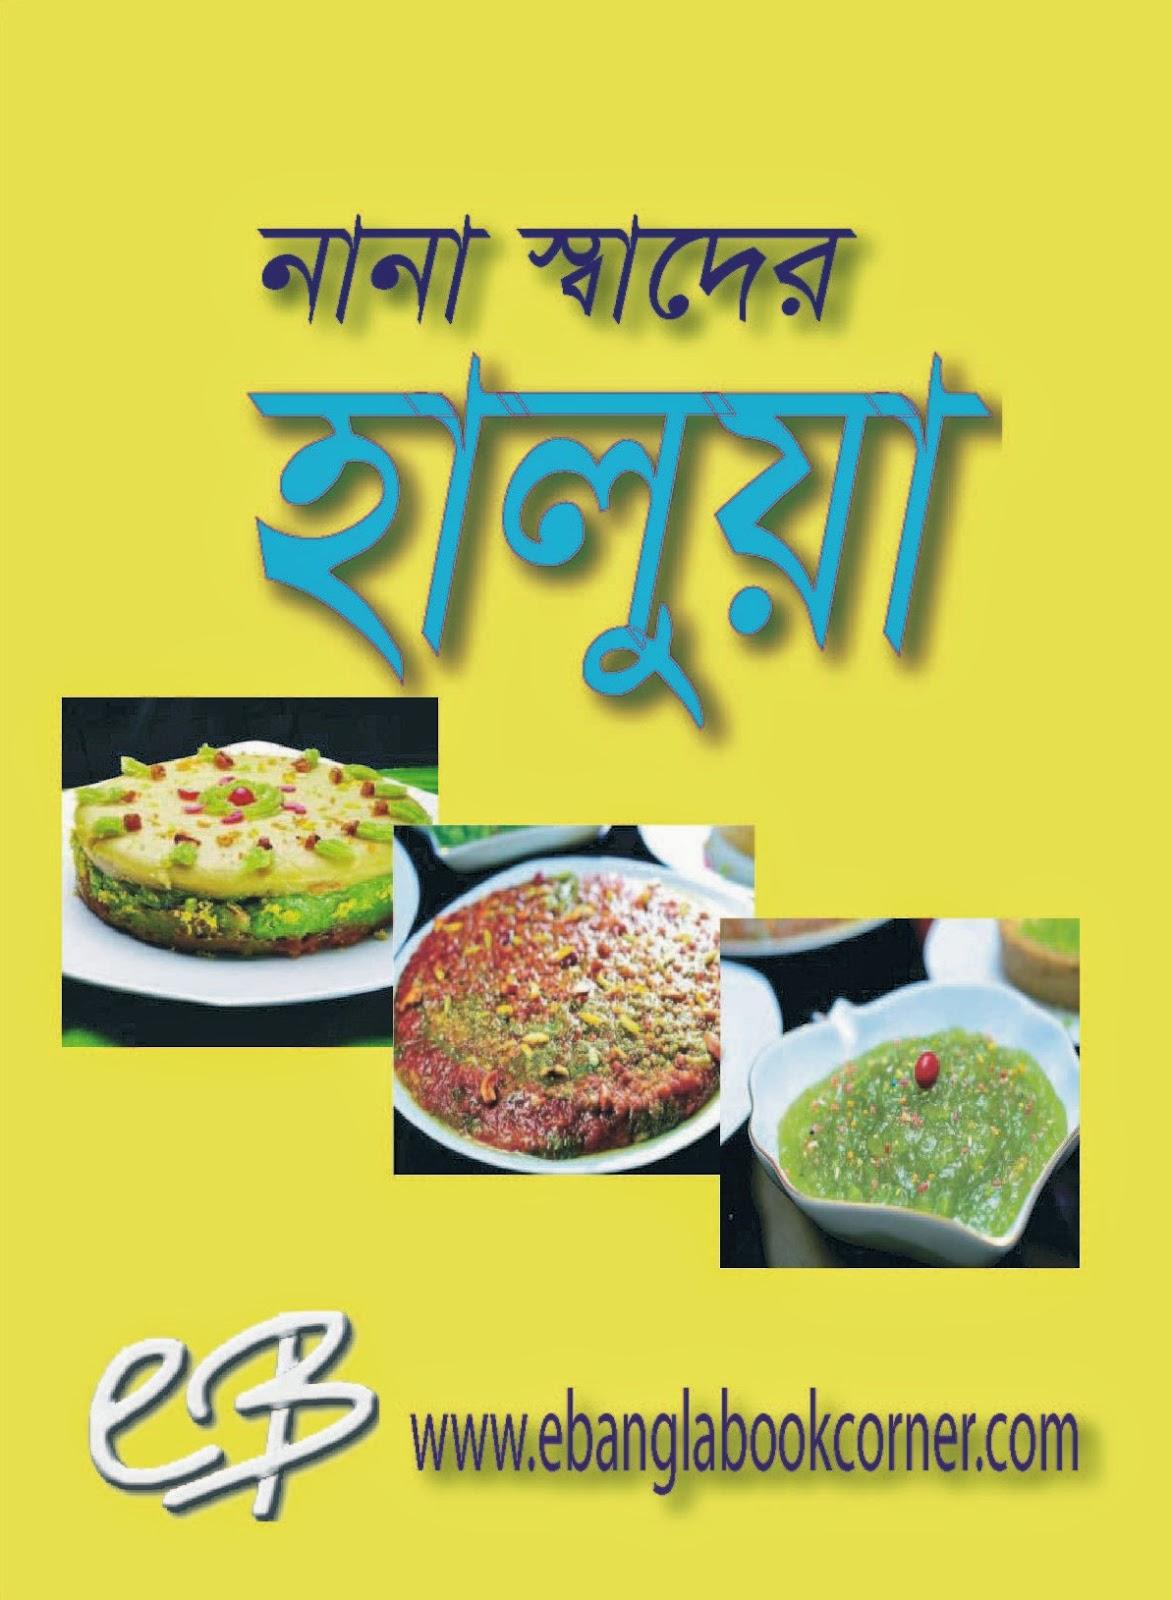 Bangla e books free downloaddownload pdf ebooks all types 2014 bengali recipe book nana swader haluya pdf download forumfinder Image collections